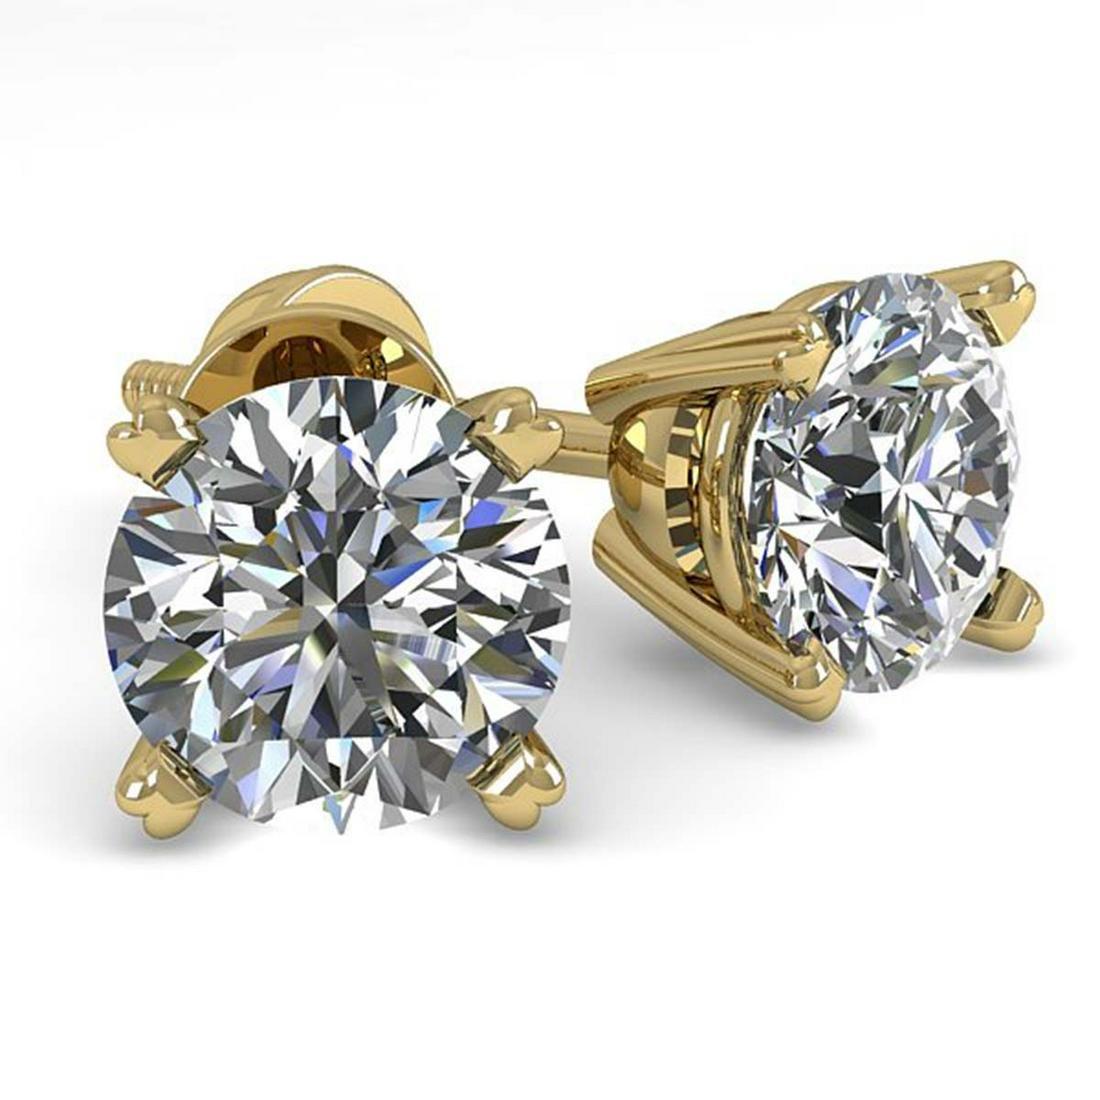 1.02 ctw VS/SI Diamond Stud Earrings 14K Yellow Gold -